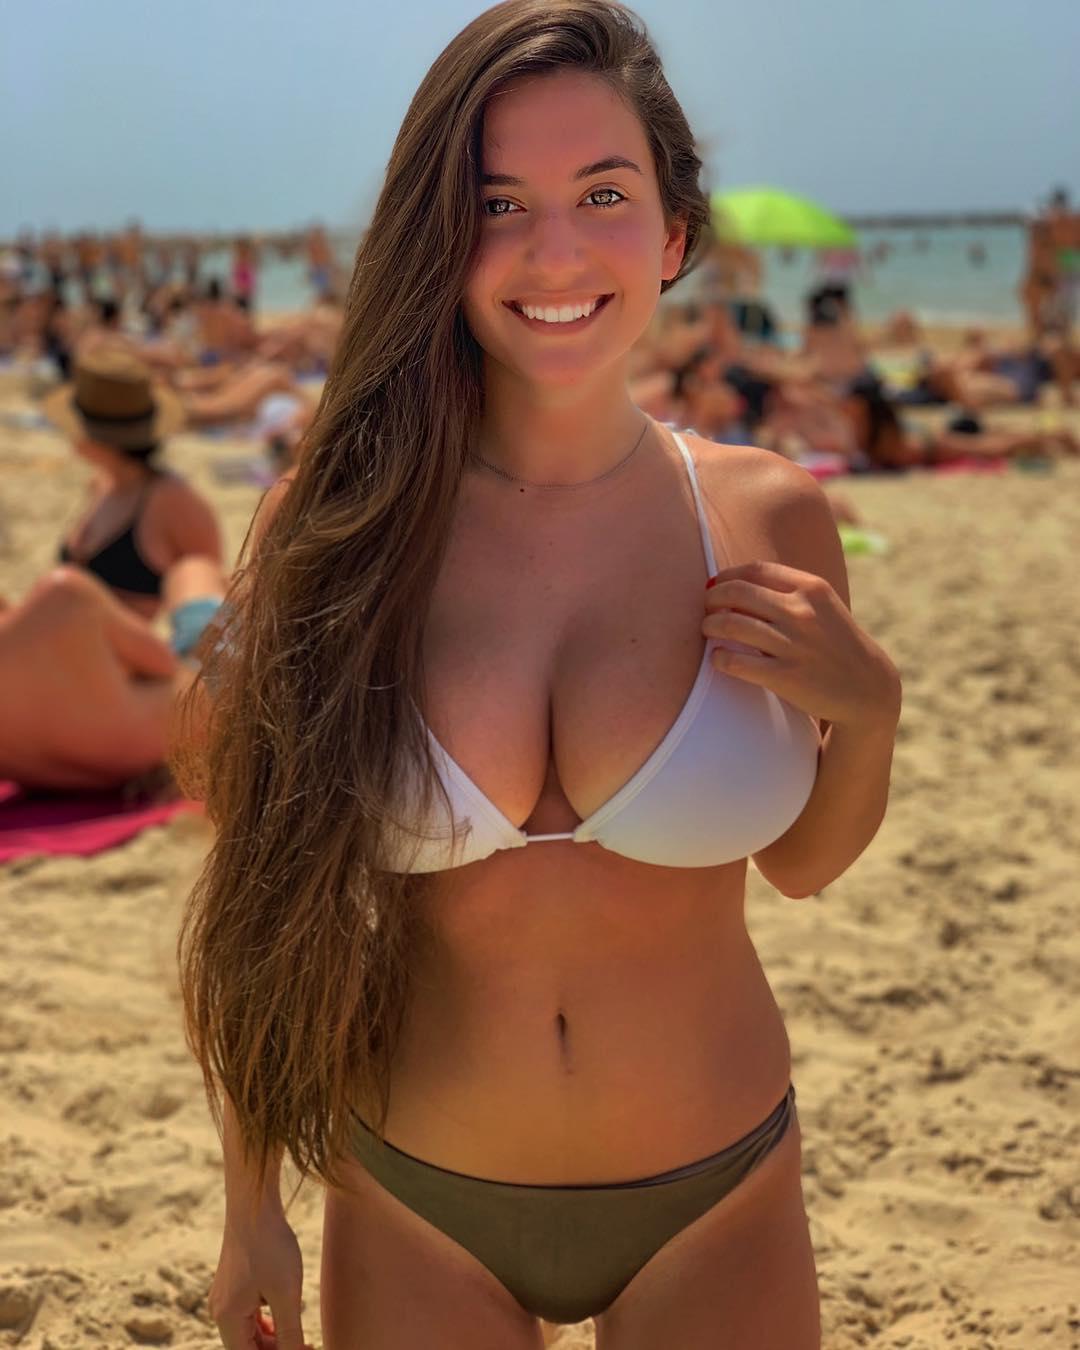 Bikinis For Girls With Big Boobs